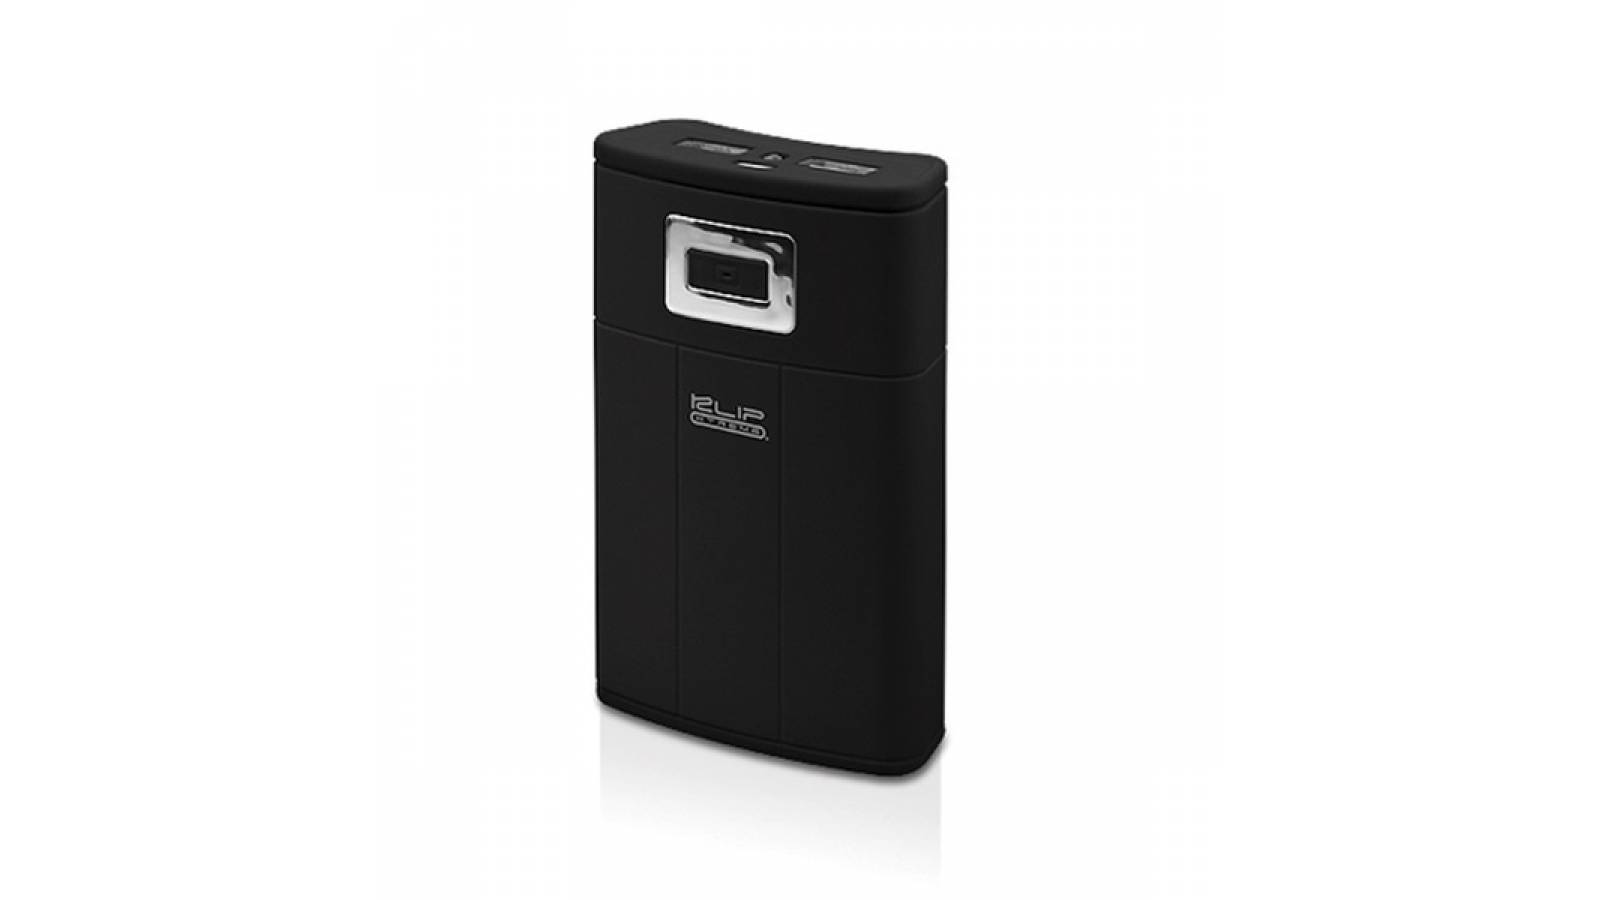 POWER BANK KBH-185- 7800MHA 2 USB- 1 MICRO USB